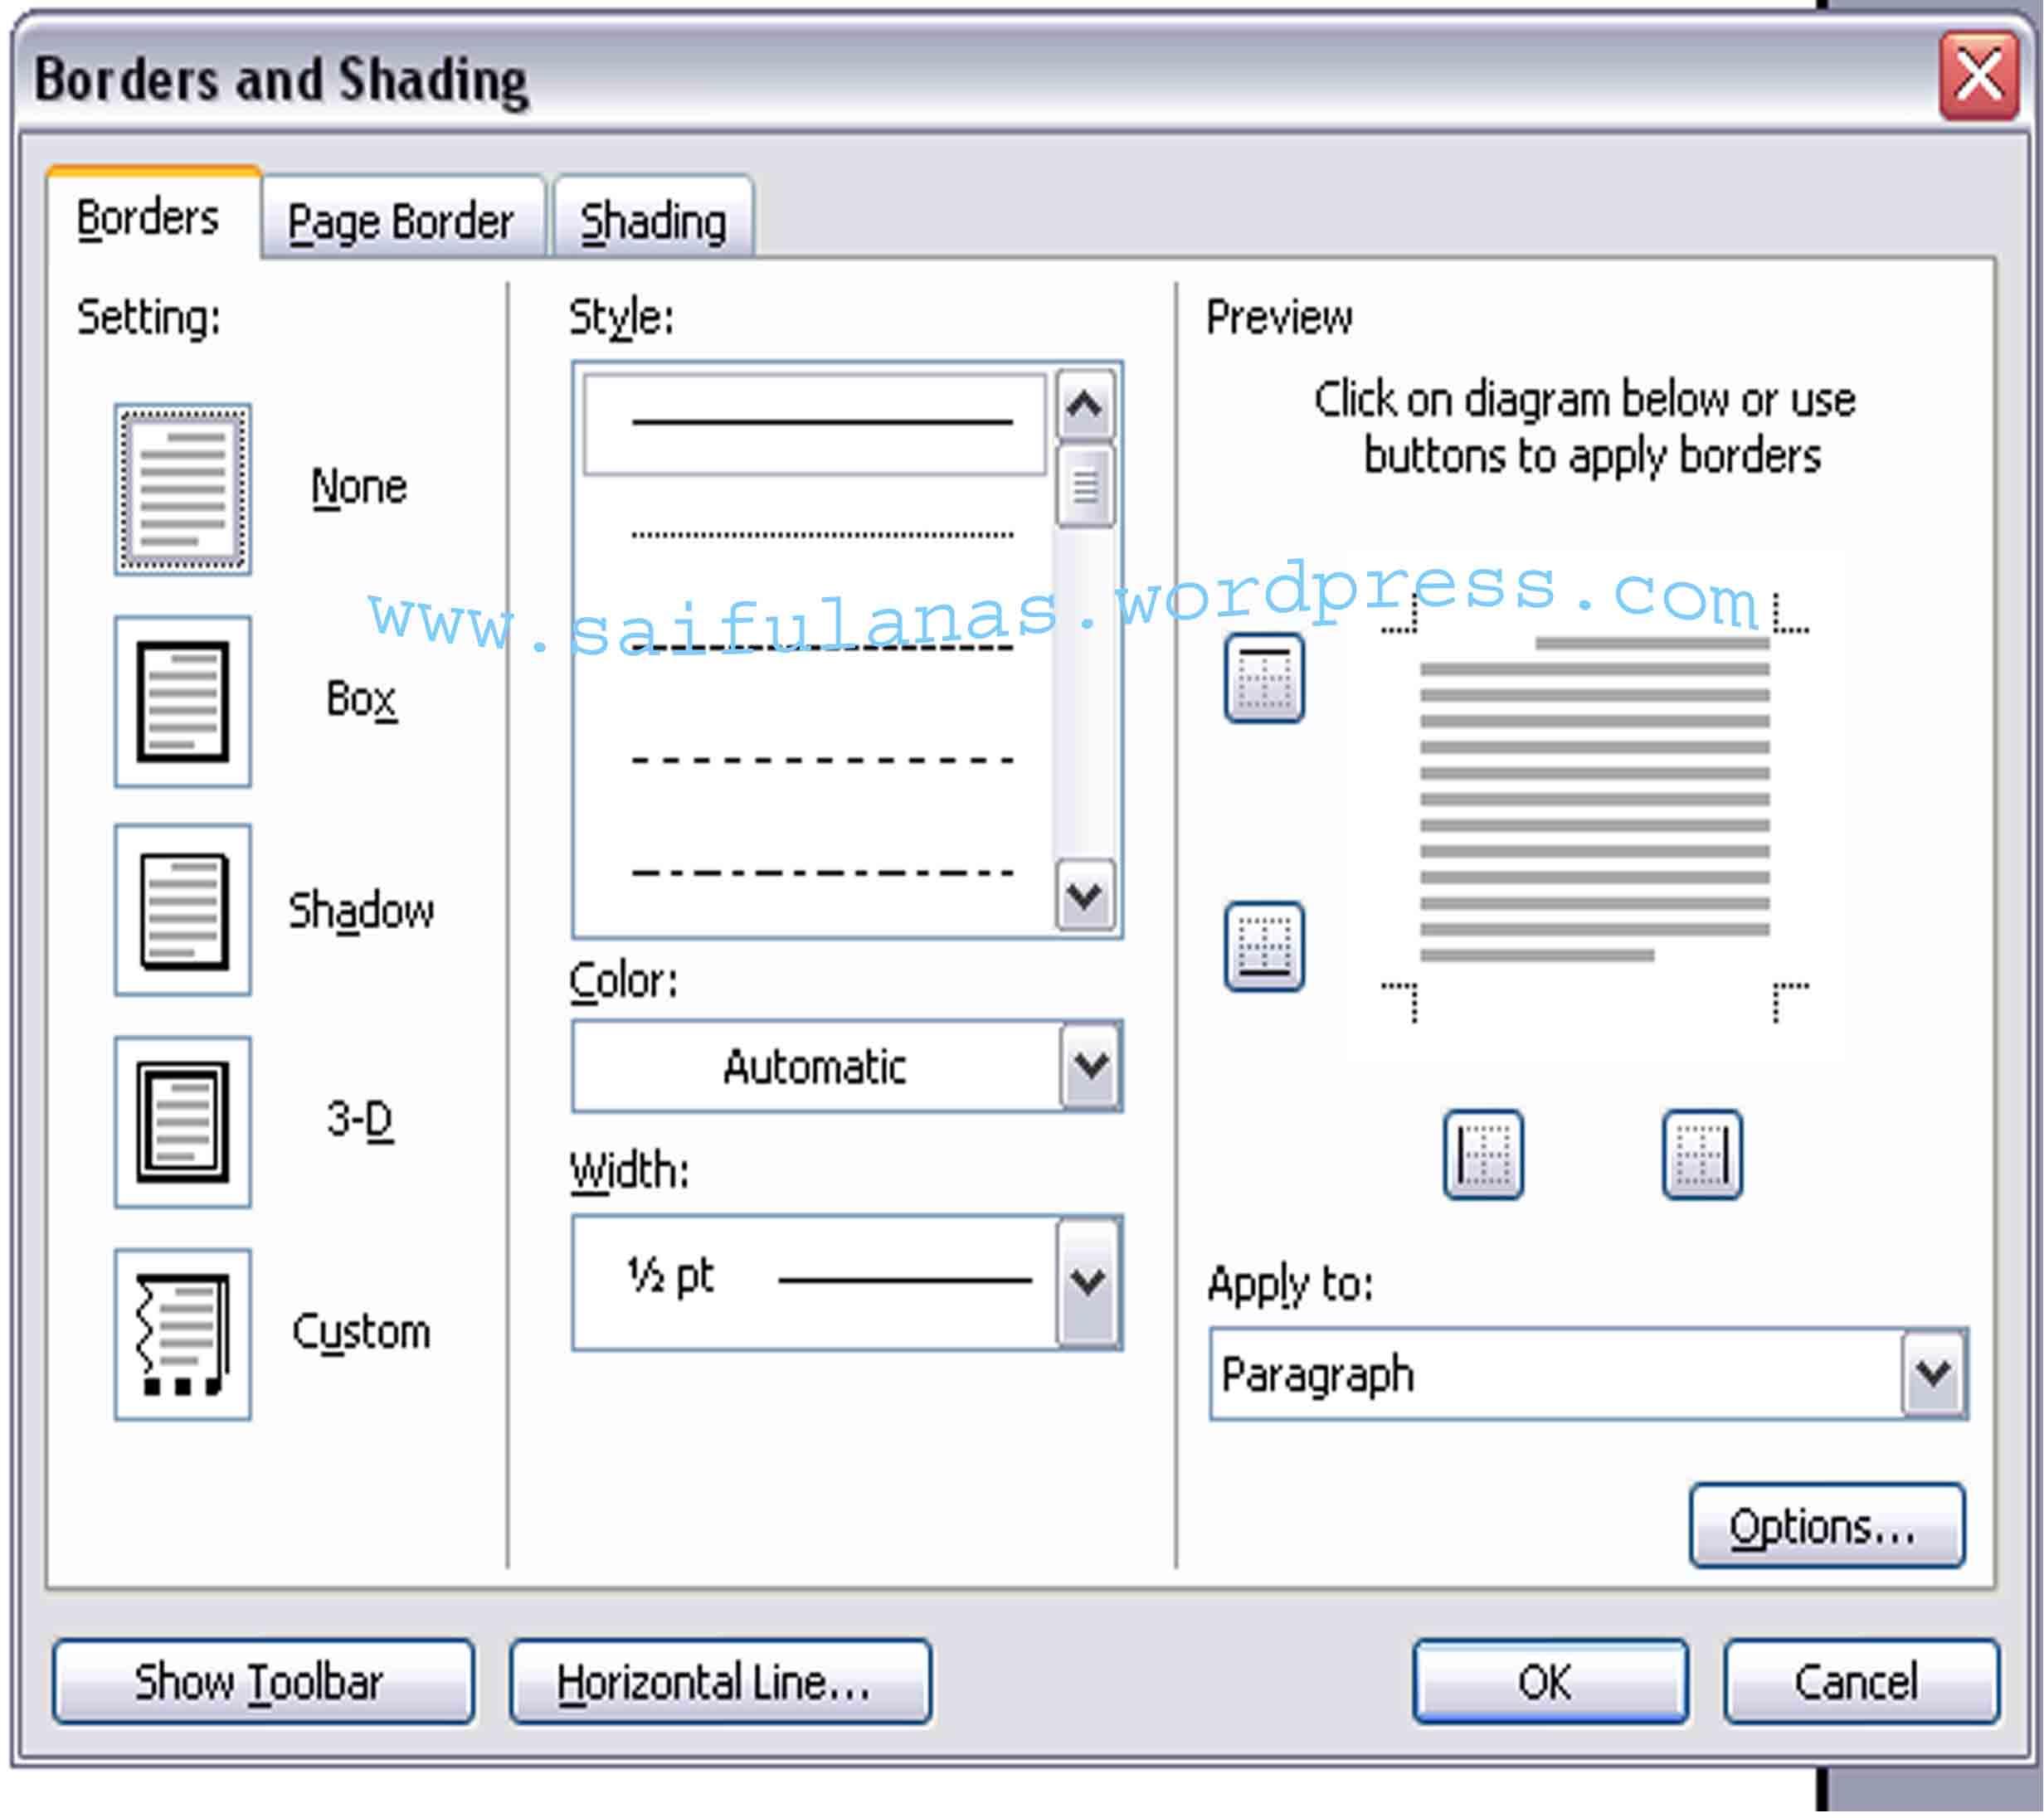 Instal border di ms word 2003 glance technology lalu pilih tab page border klik tanda panah pada art bila di ms word belum ada maka akan kosong dan otomatis akan langsung nginstal sendiri ccuart Gallery